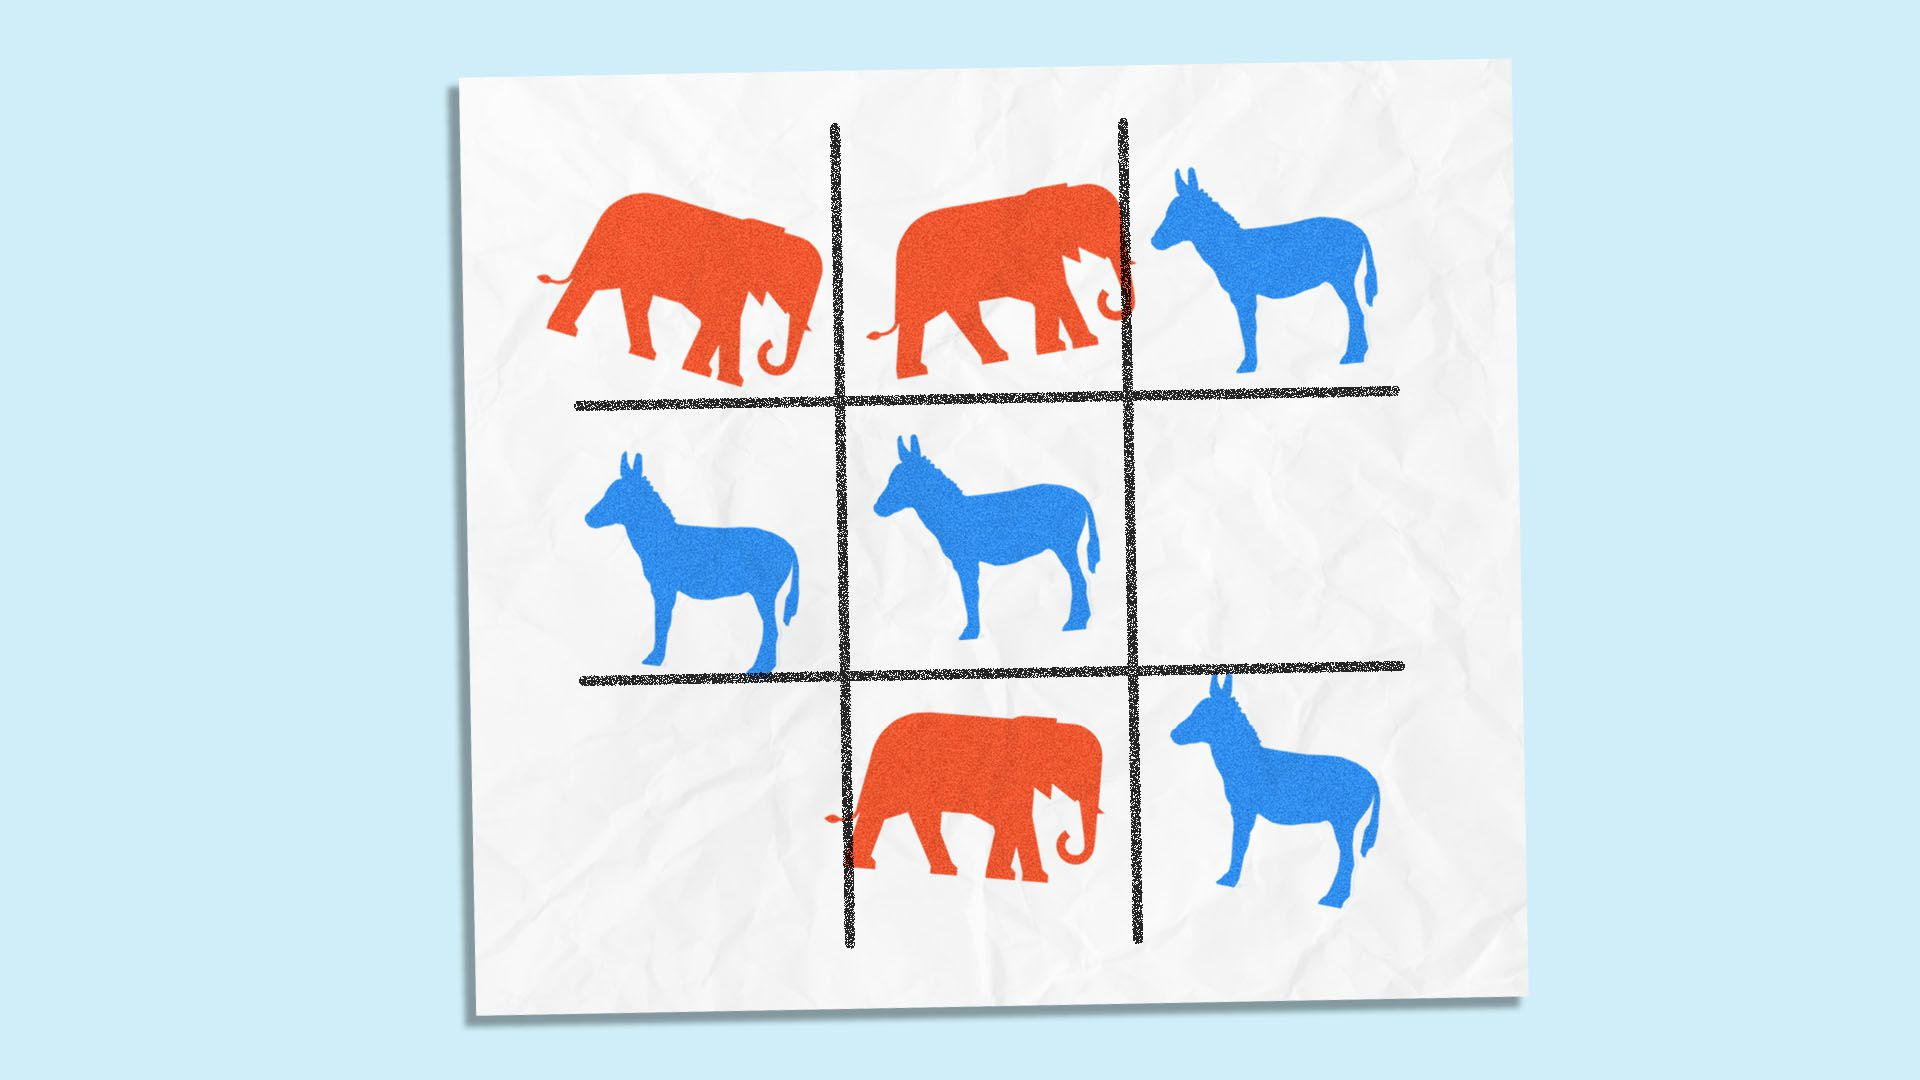 Illustration of unwinnable tic-tac-toe board with elephants and donkeys